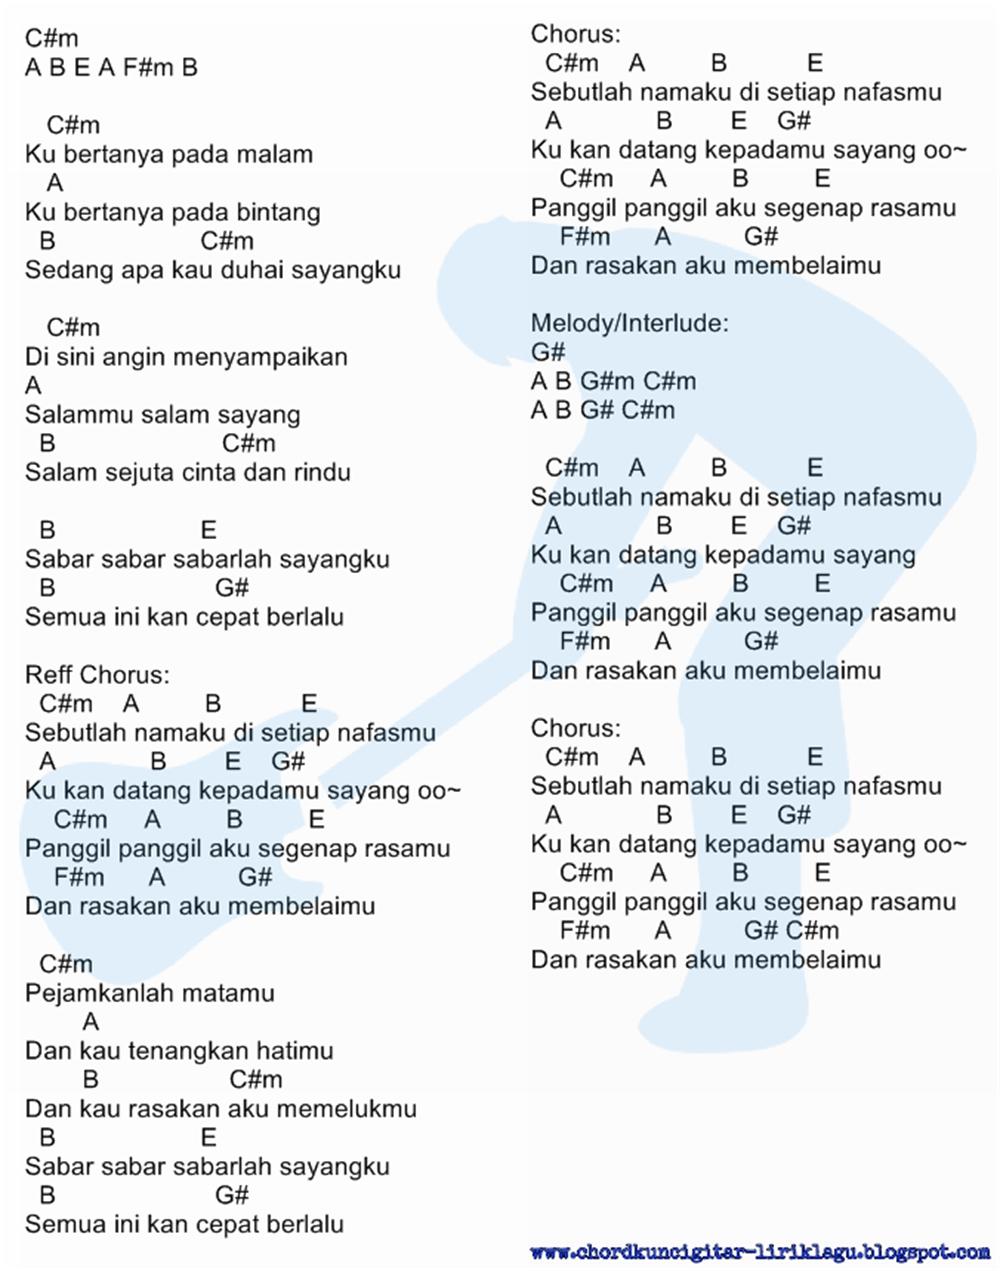 Chord Belum Punah : chord, belum, punah, Chord